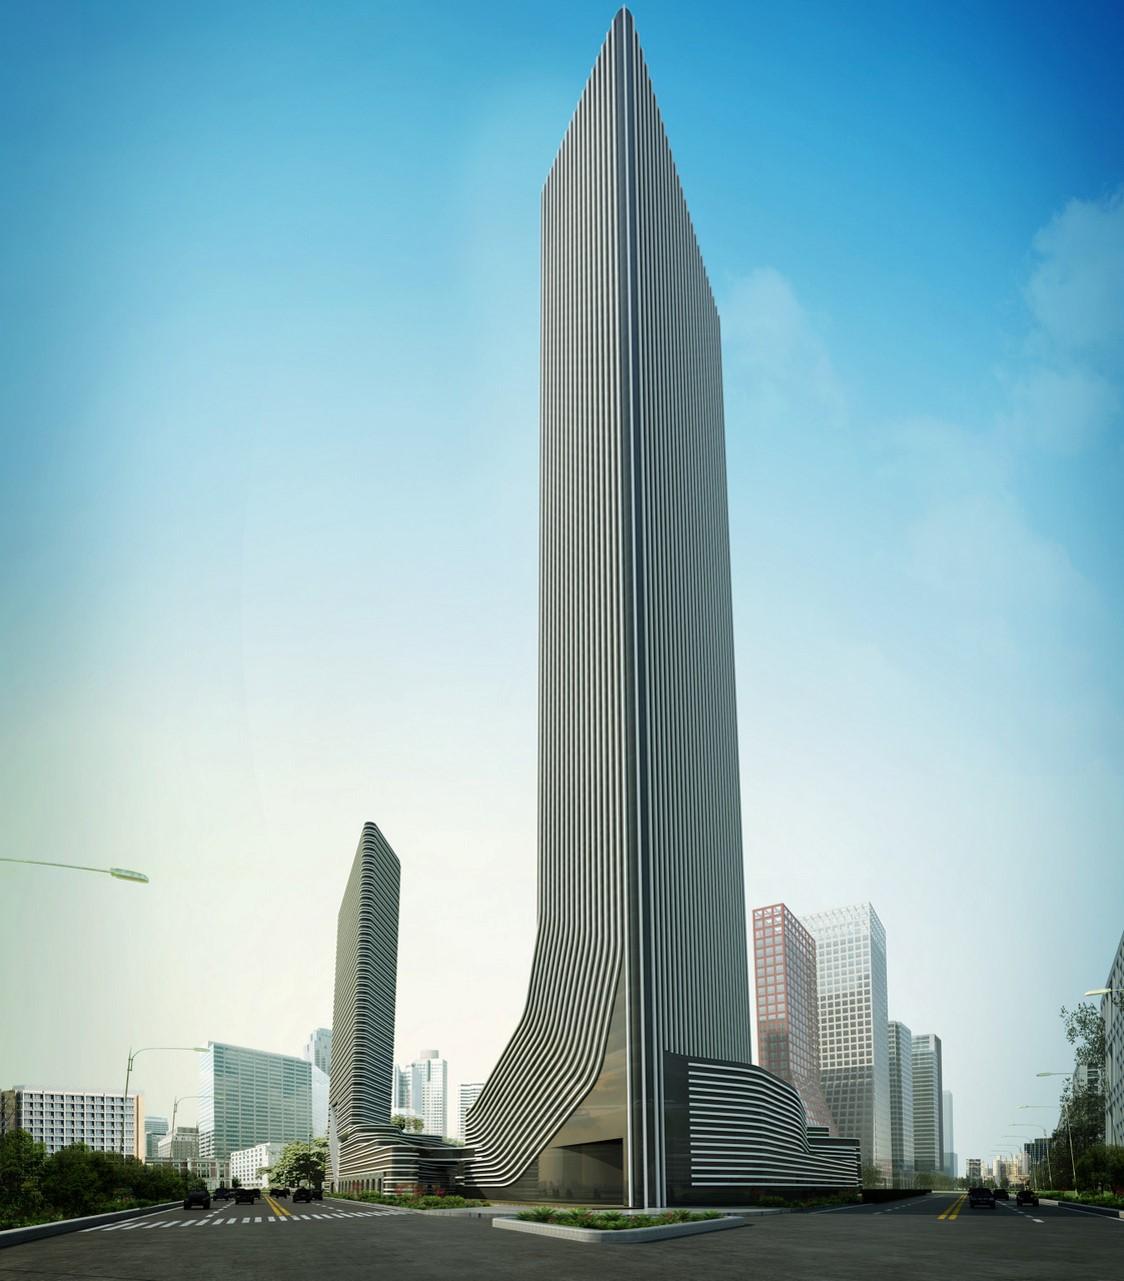 Mixed Use Development, Shenyang, China - Wilson Architects